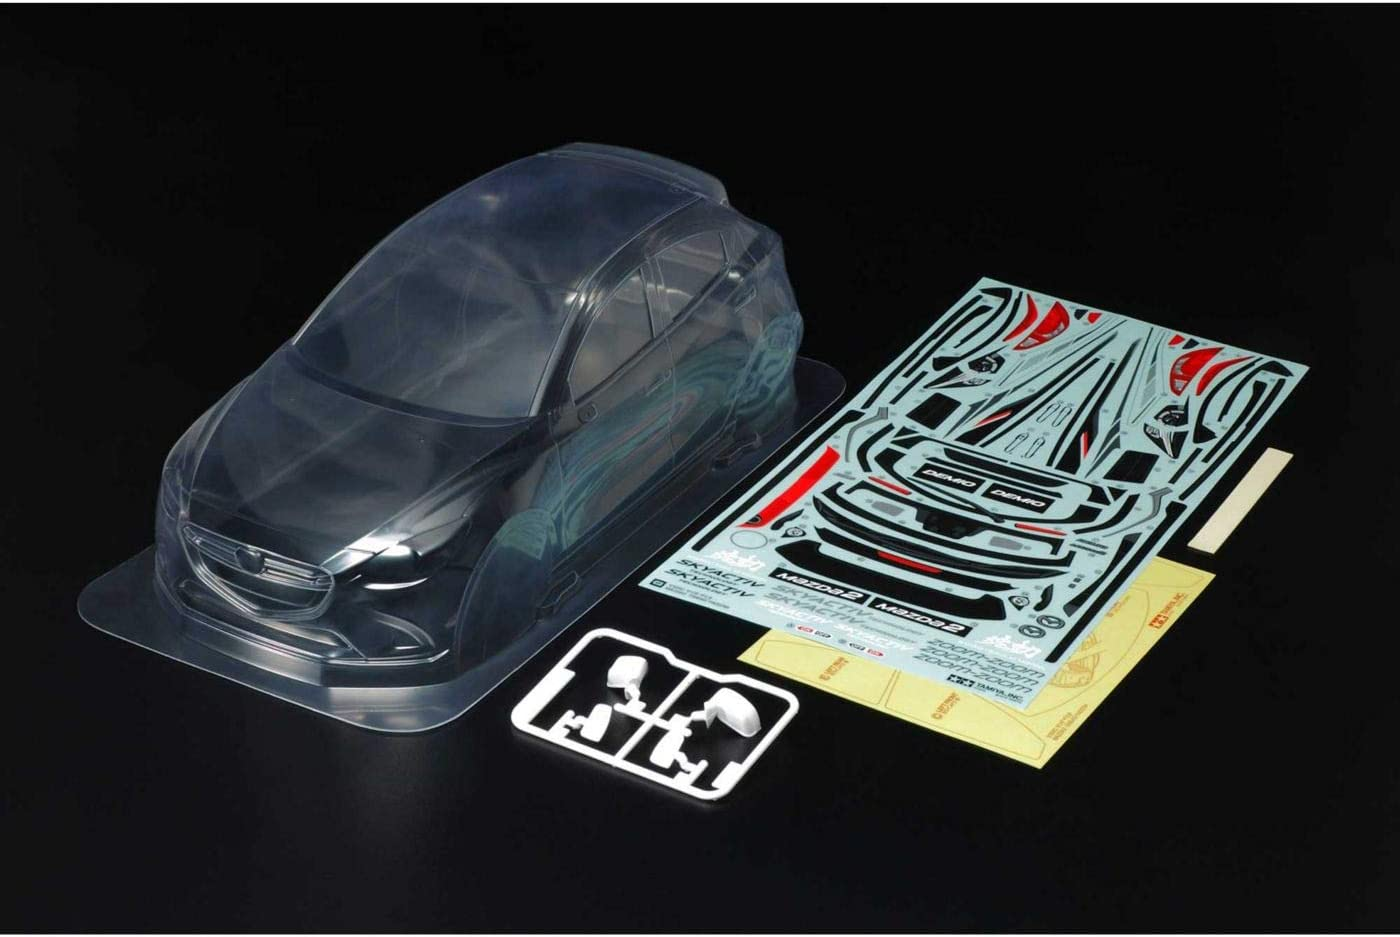 Tamiya America Inc Mazda2 Japan Maker New Lightweight Parts Set Body Max 89% OFF TAM47369